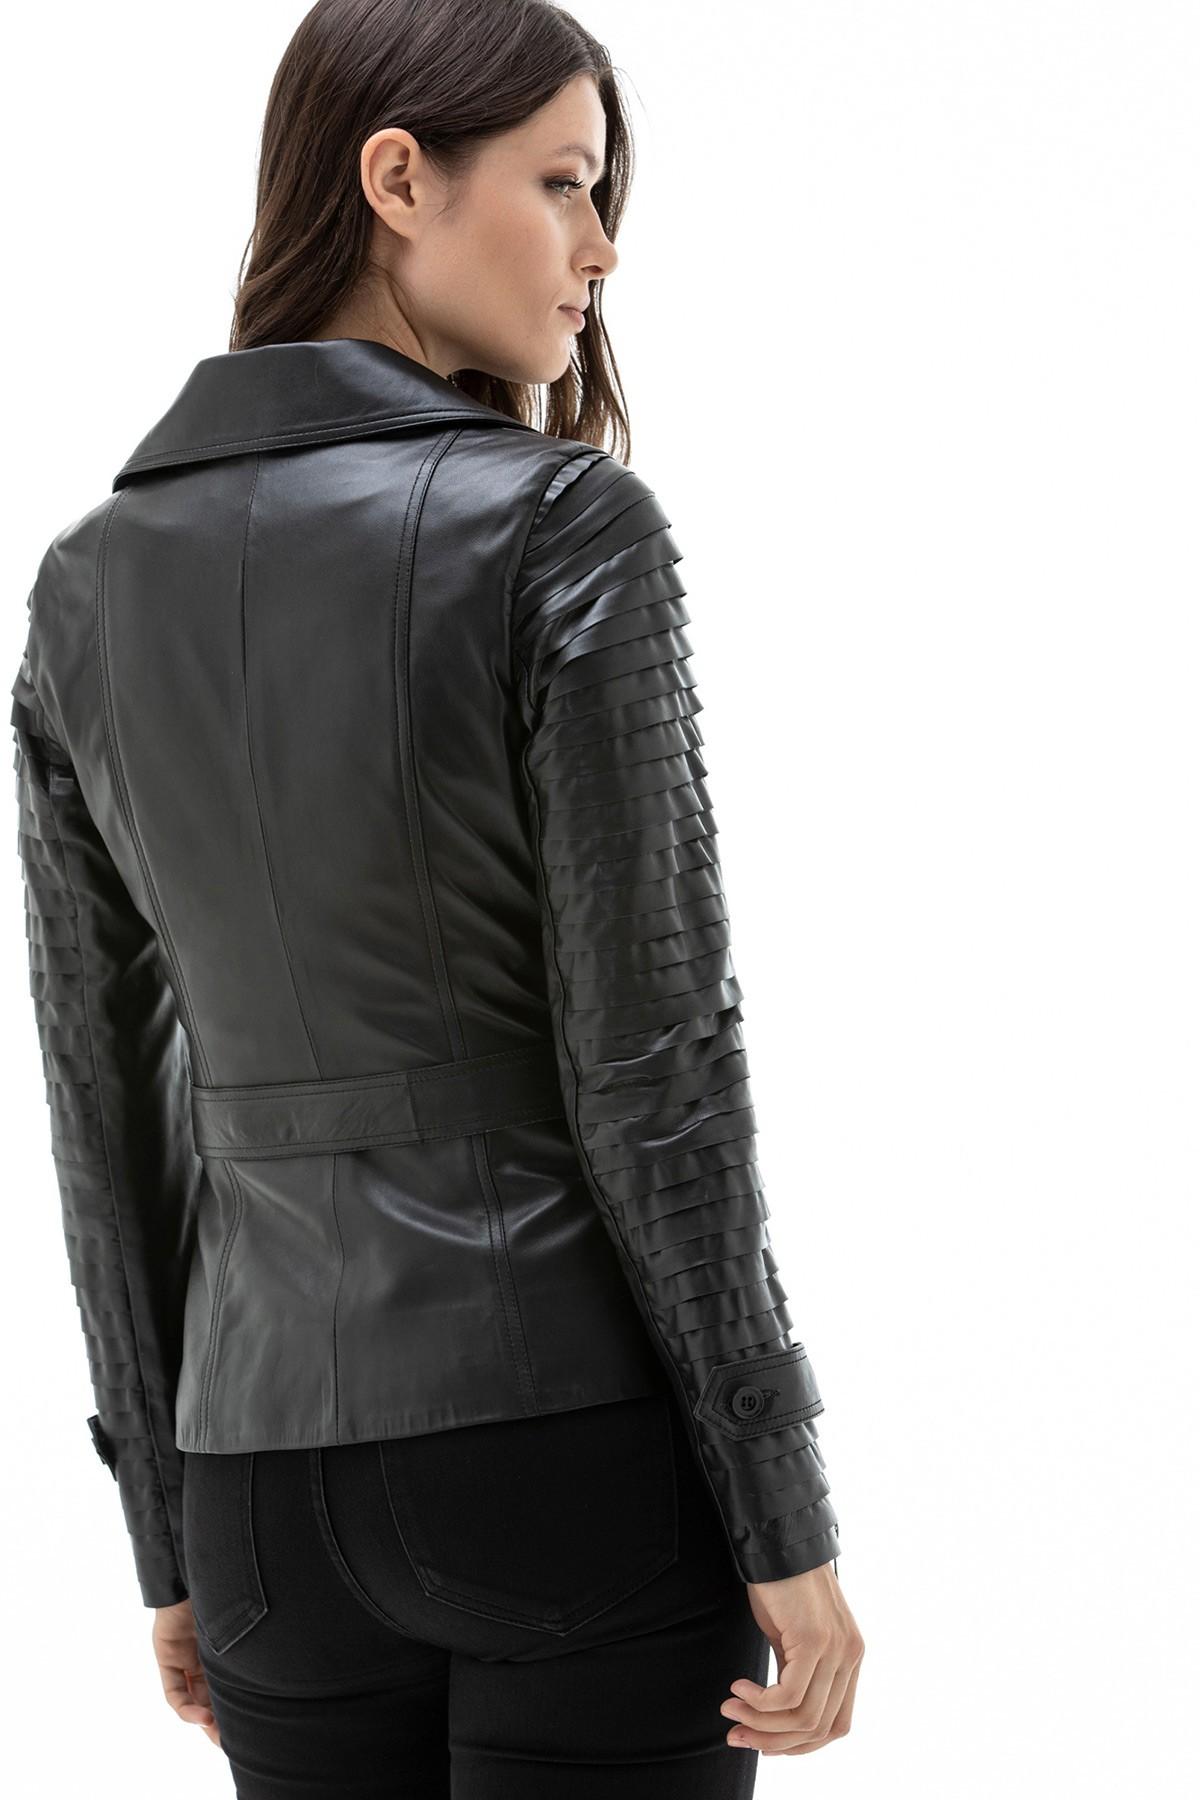 Burberry Leather Jacket Ladies